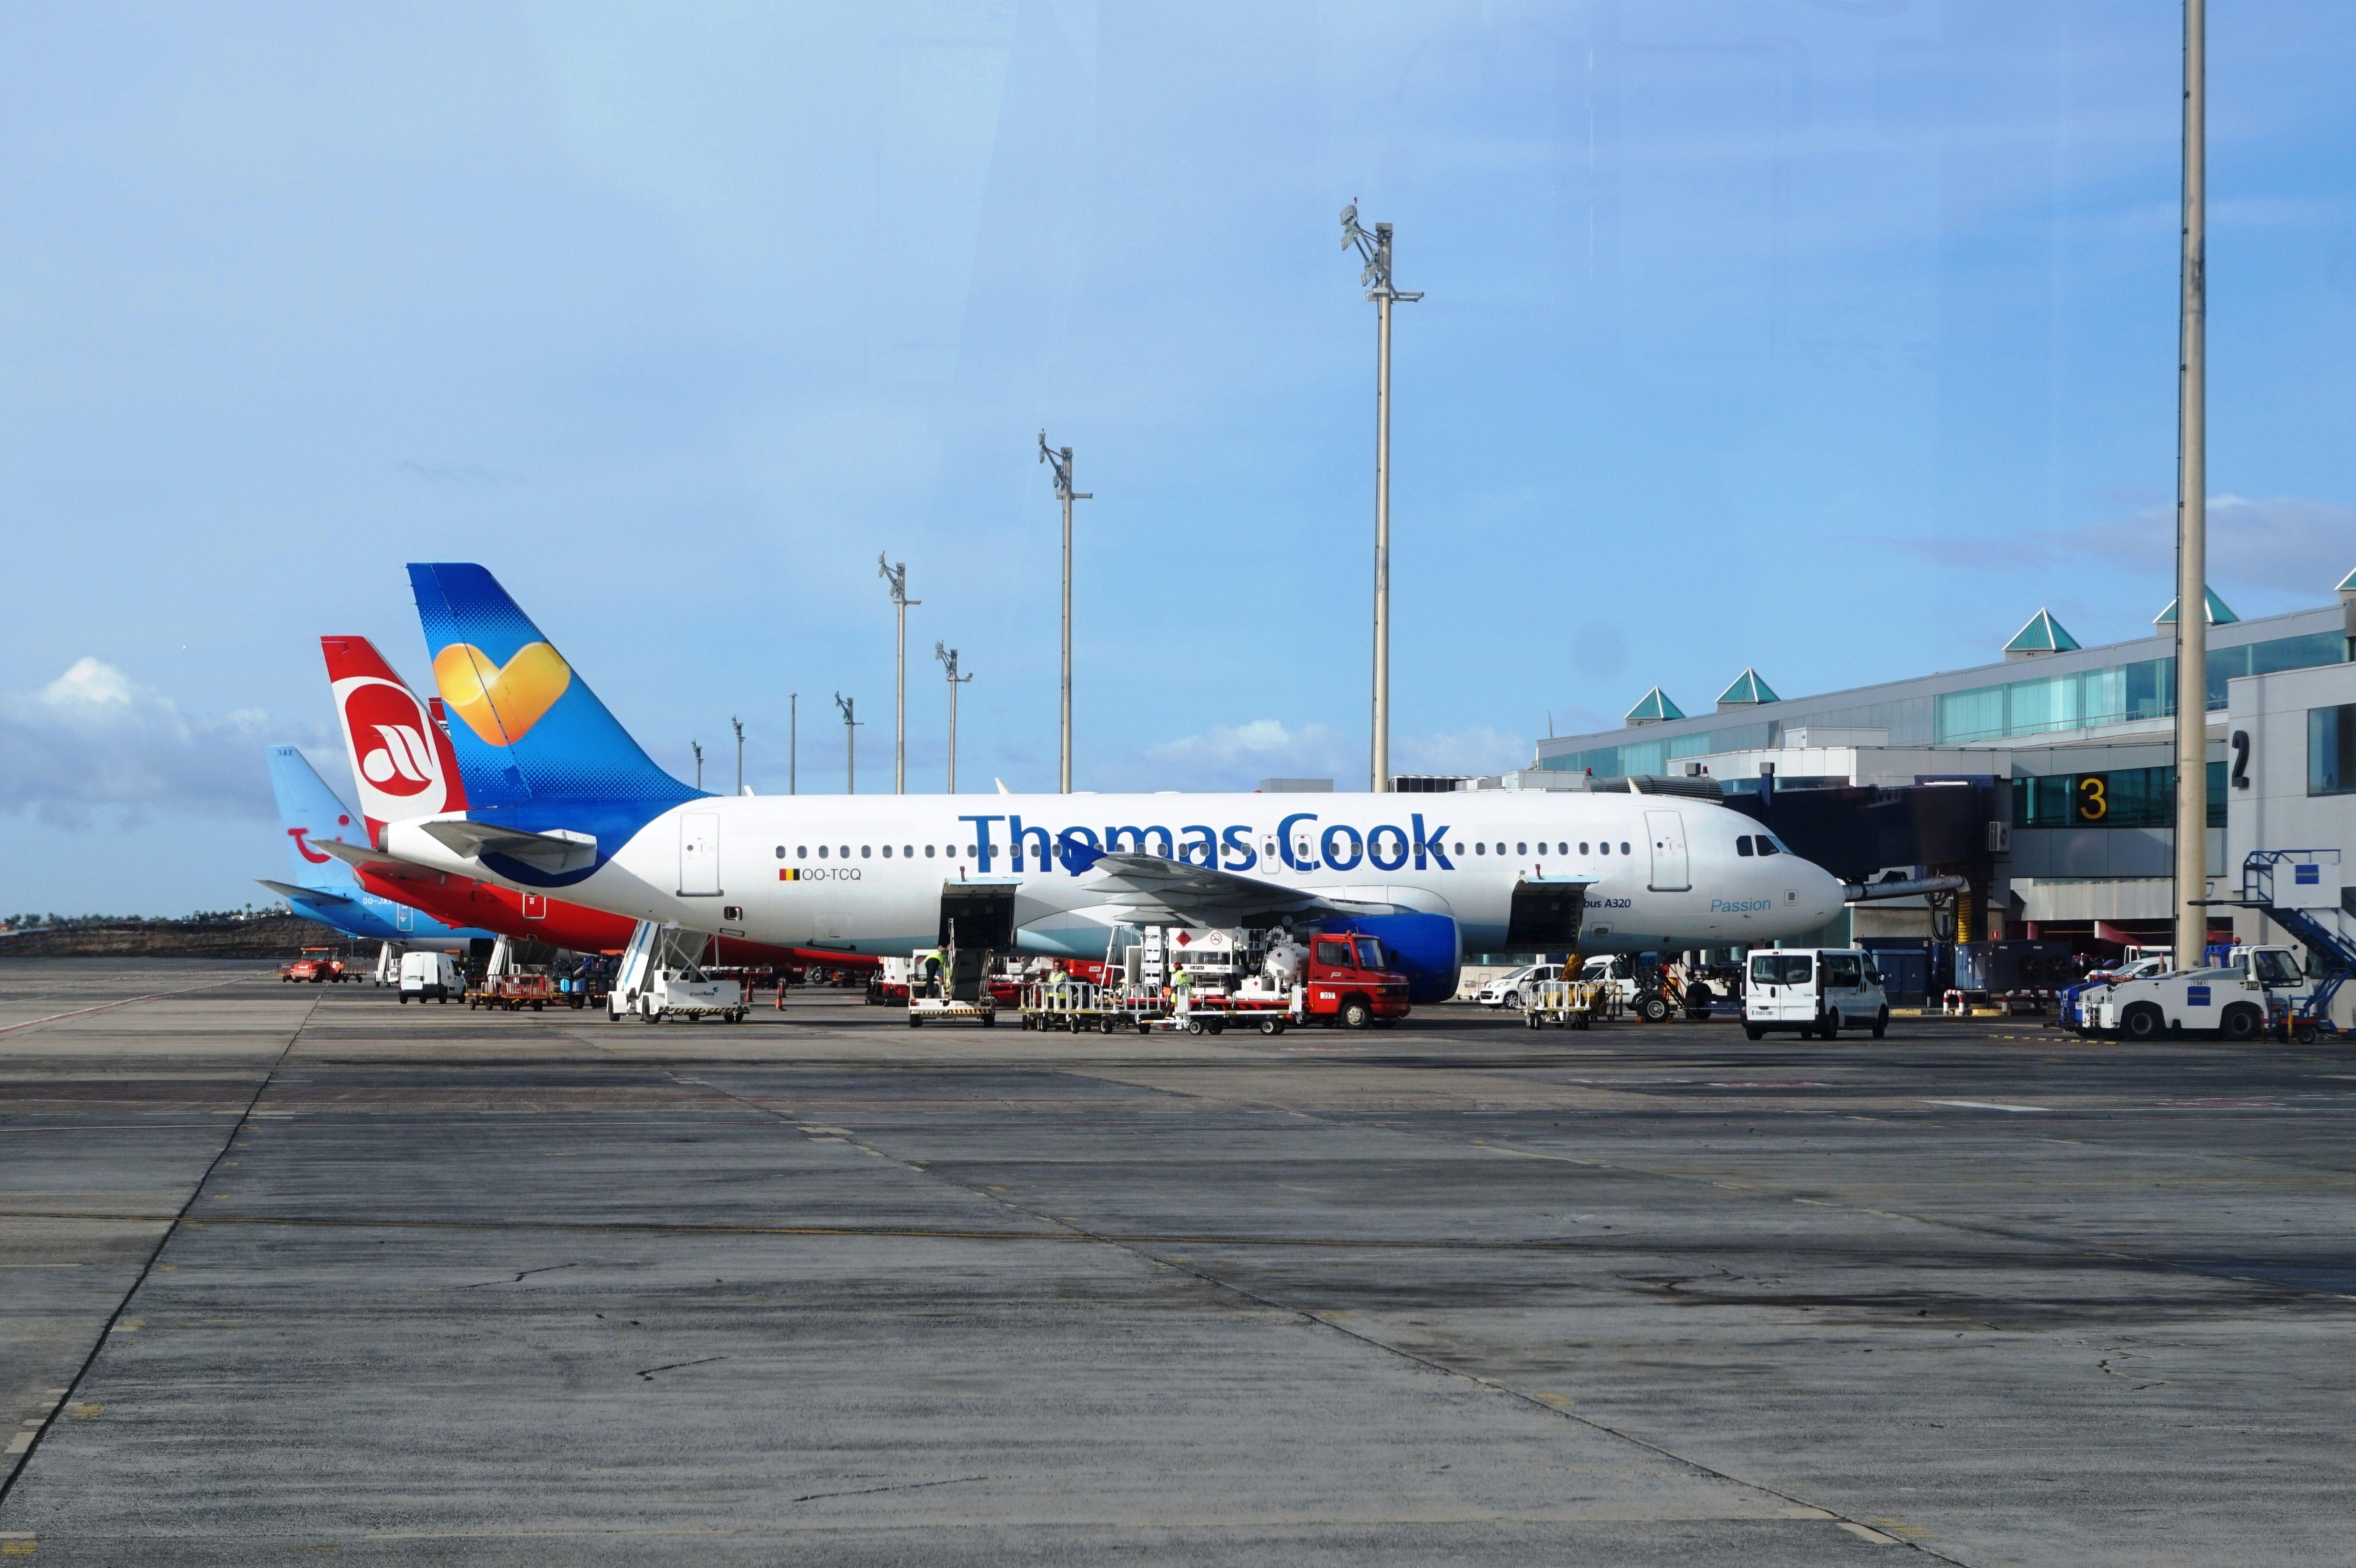 Planes At Tenerife South Airport Aeroporto Veiculos